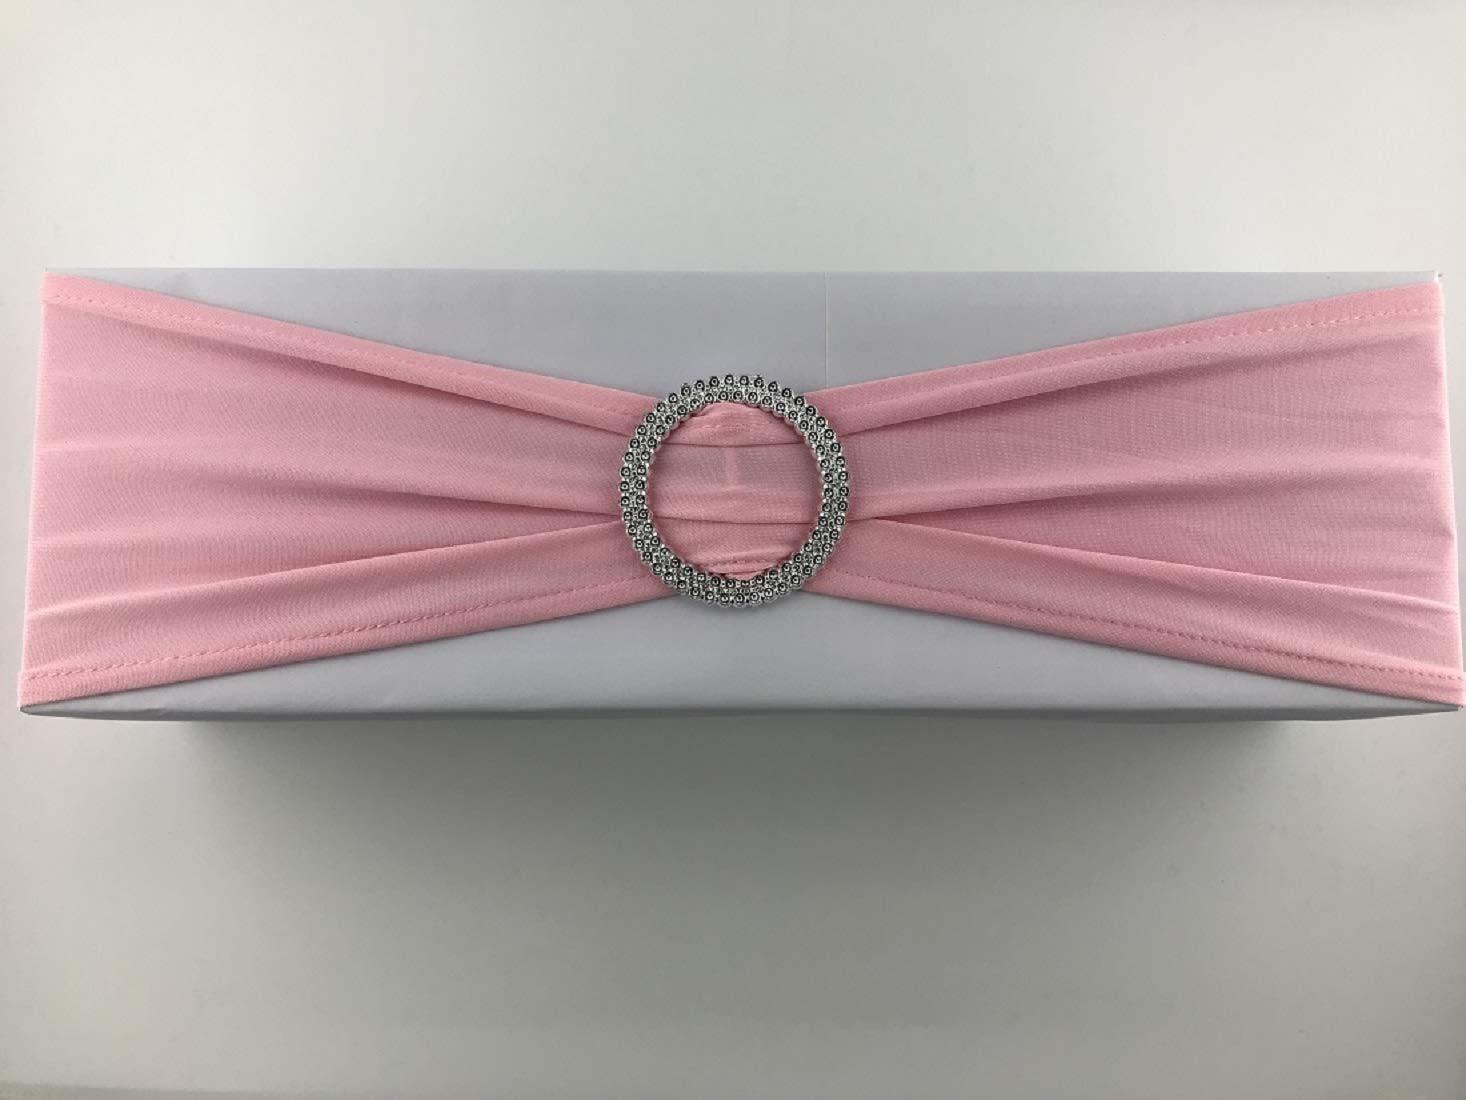 Lush Decor Pixie Fox 72 x 72 Shower Curtain Gray Triangle Home Fashions 16T000935